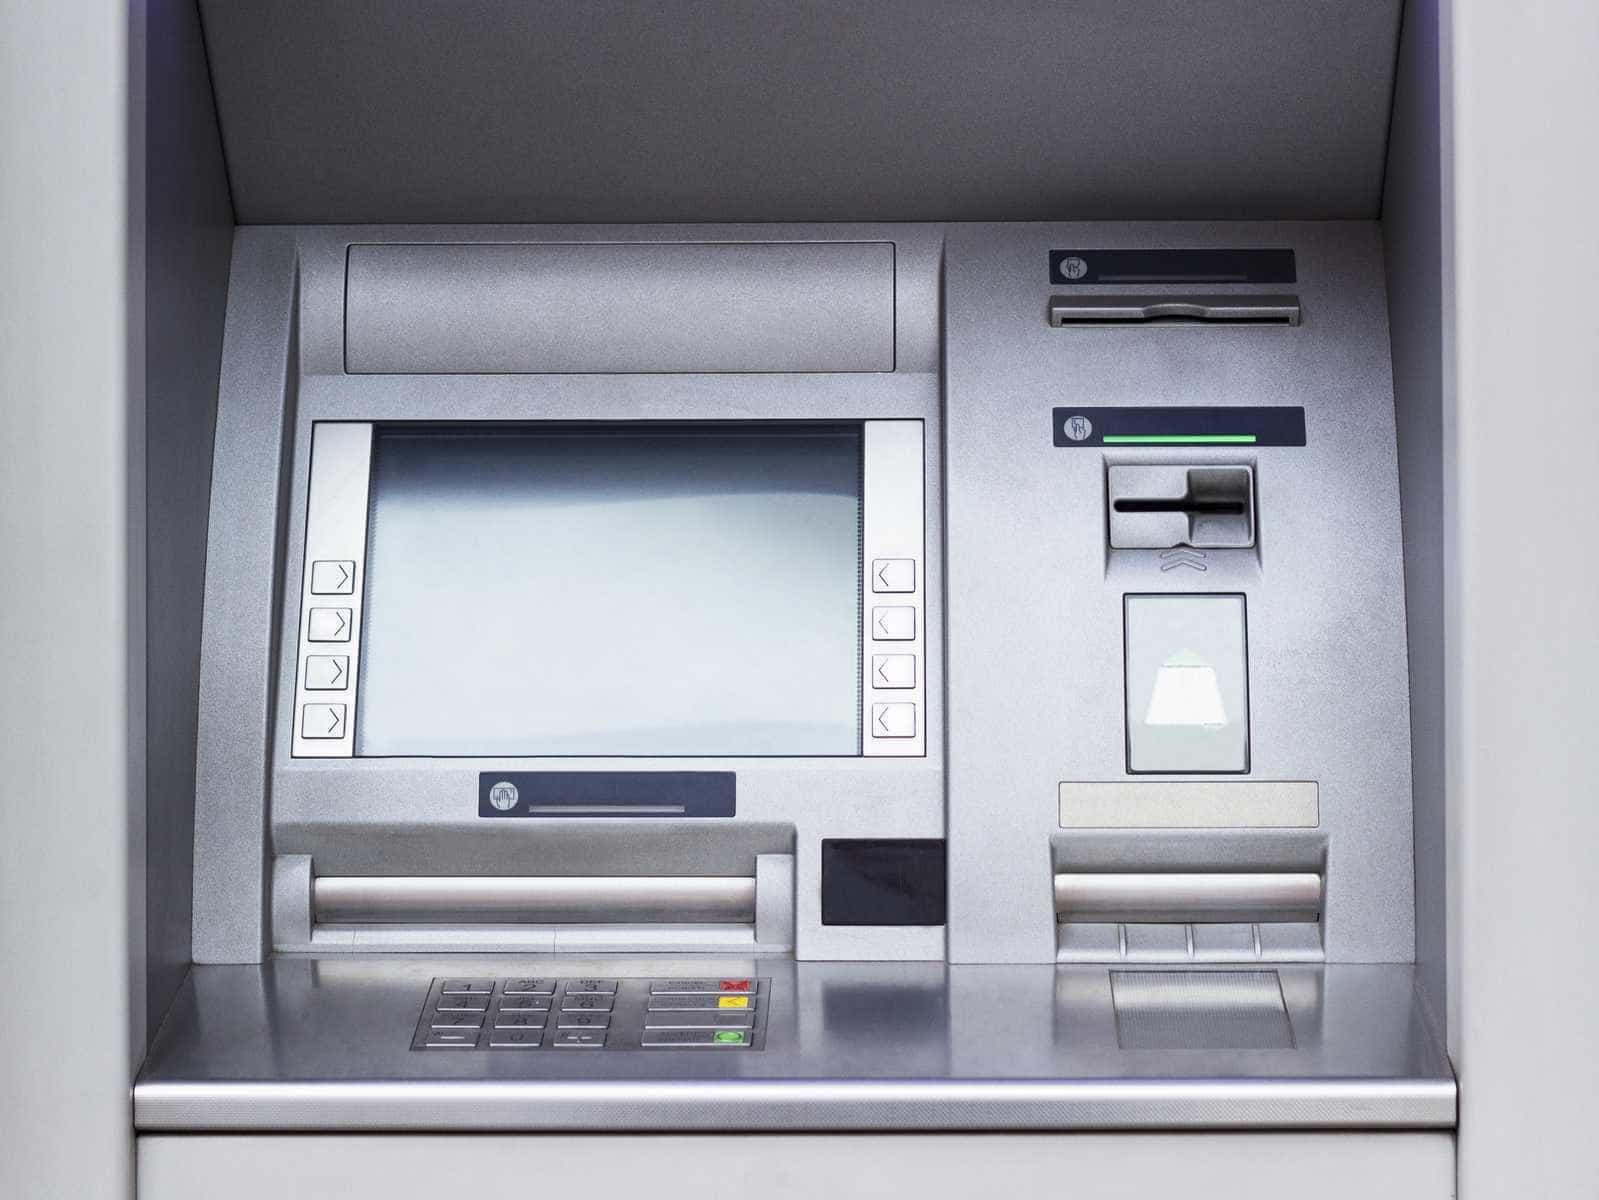 Parlamento recomenda que se facilite acesso a contas de serviços mínimos